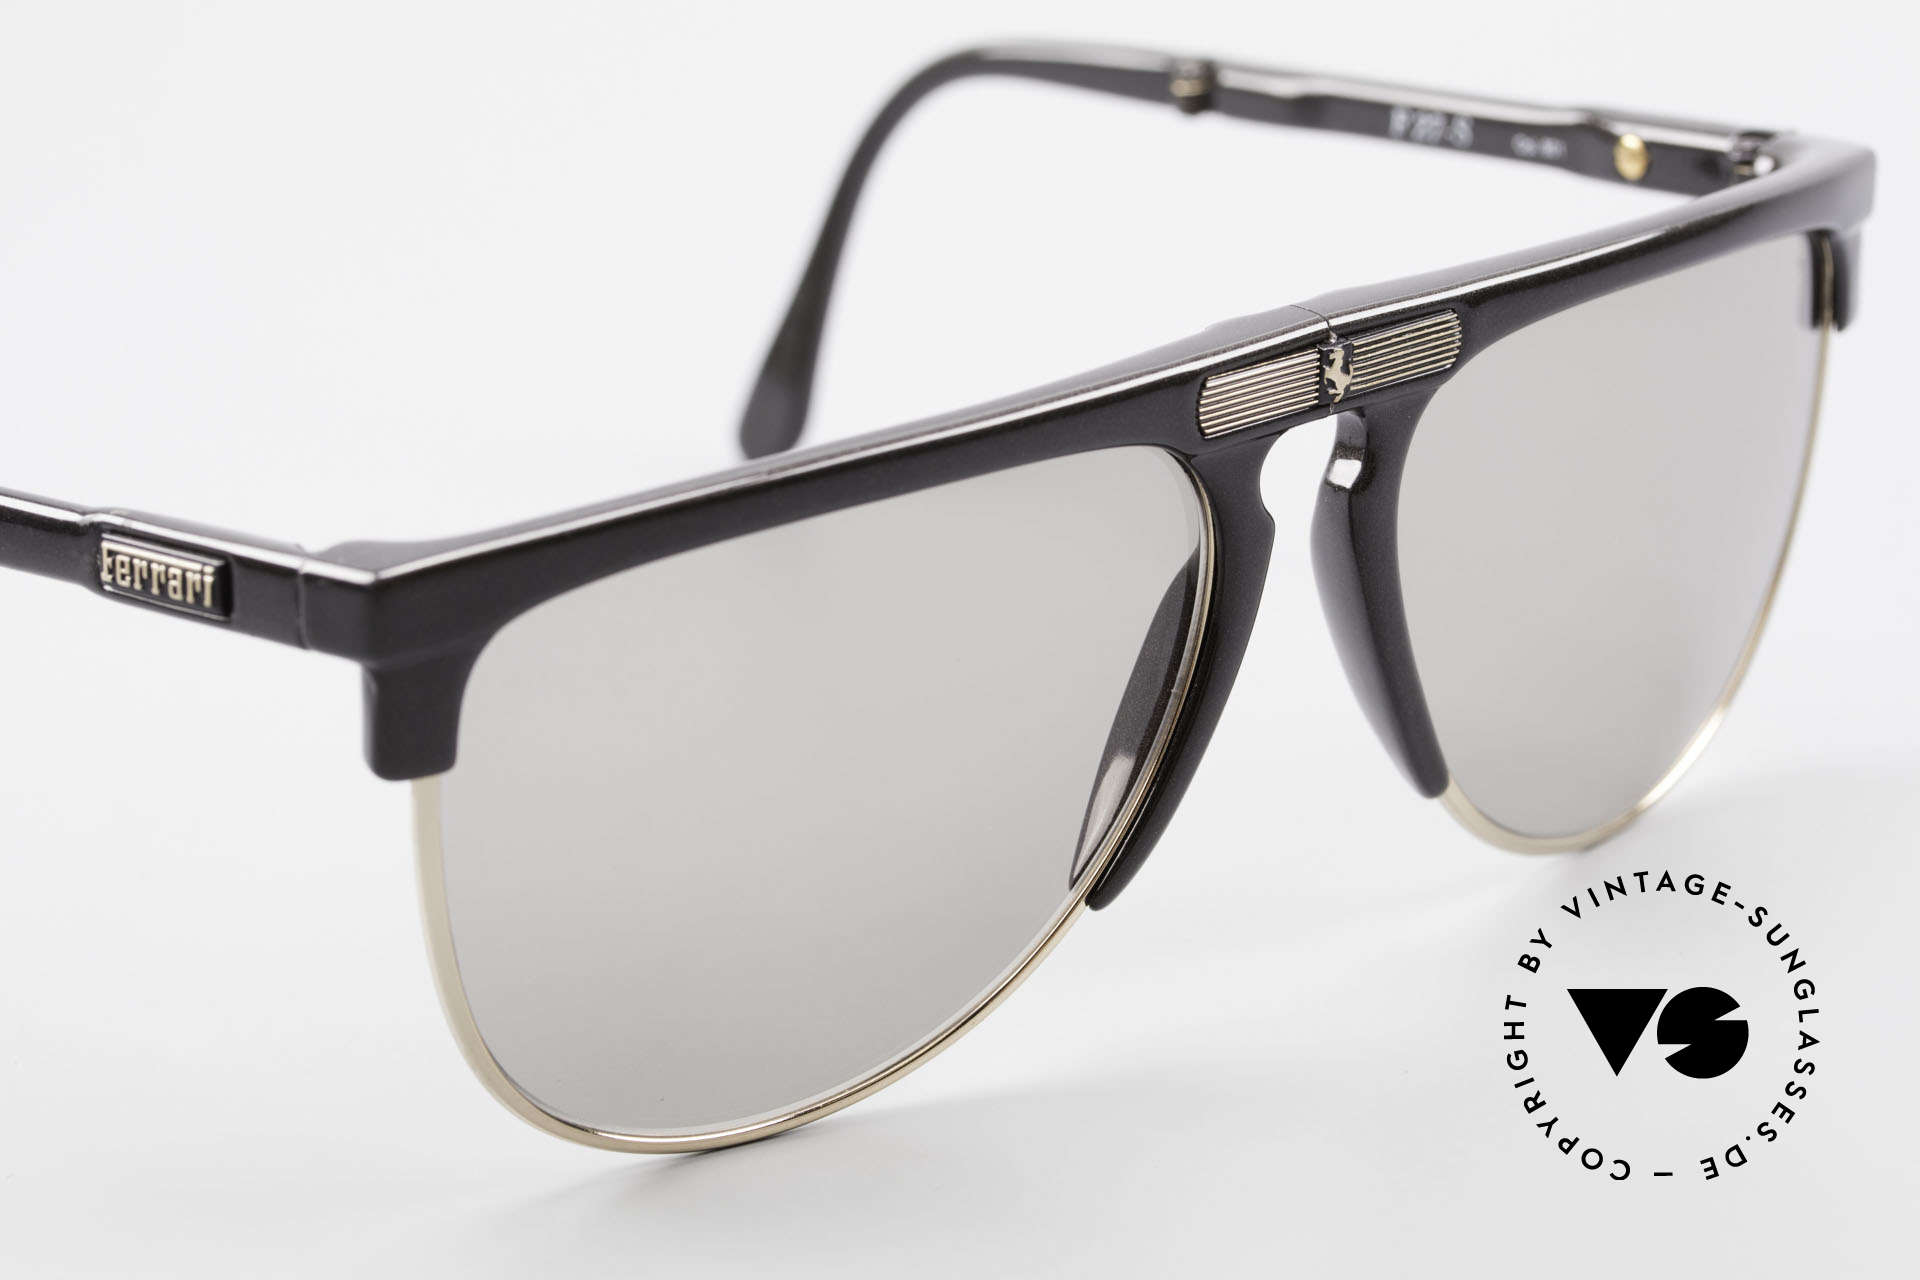 Ferrari F27/S Carbonio Folding Shades 90's, unworn (like all our rare Ferrari folding sunglasses), Made for Men